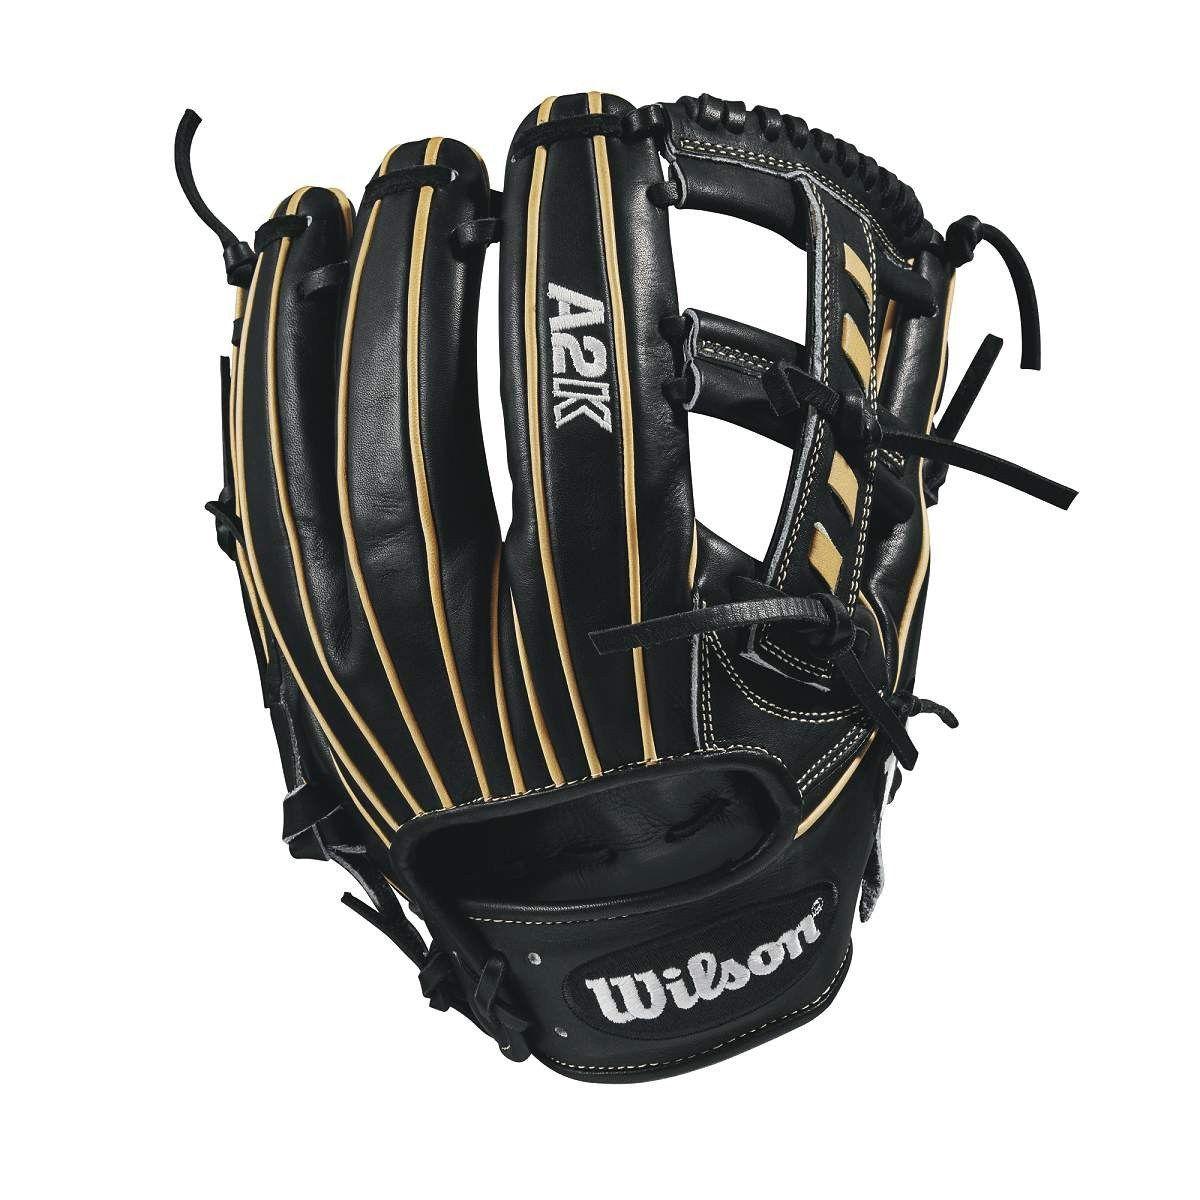 Aso S Lab Wilson A2k 1716t Baseball Glove Baseball Softball Rawlings Pro Preferred